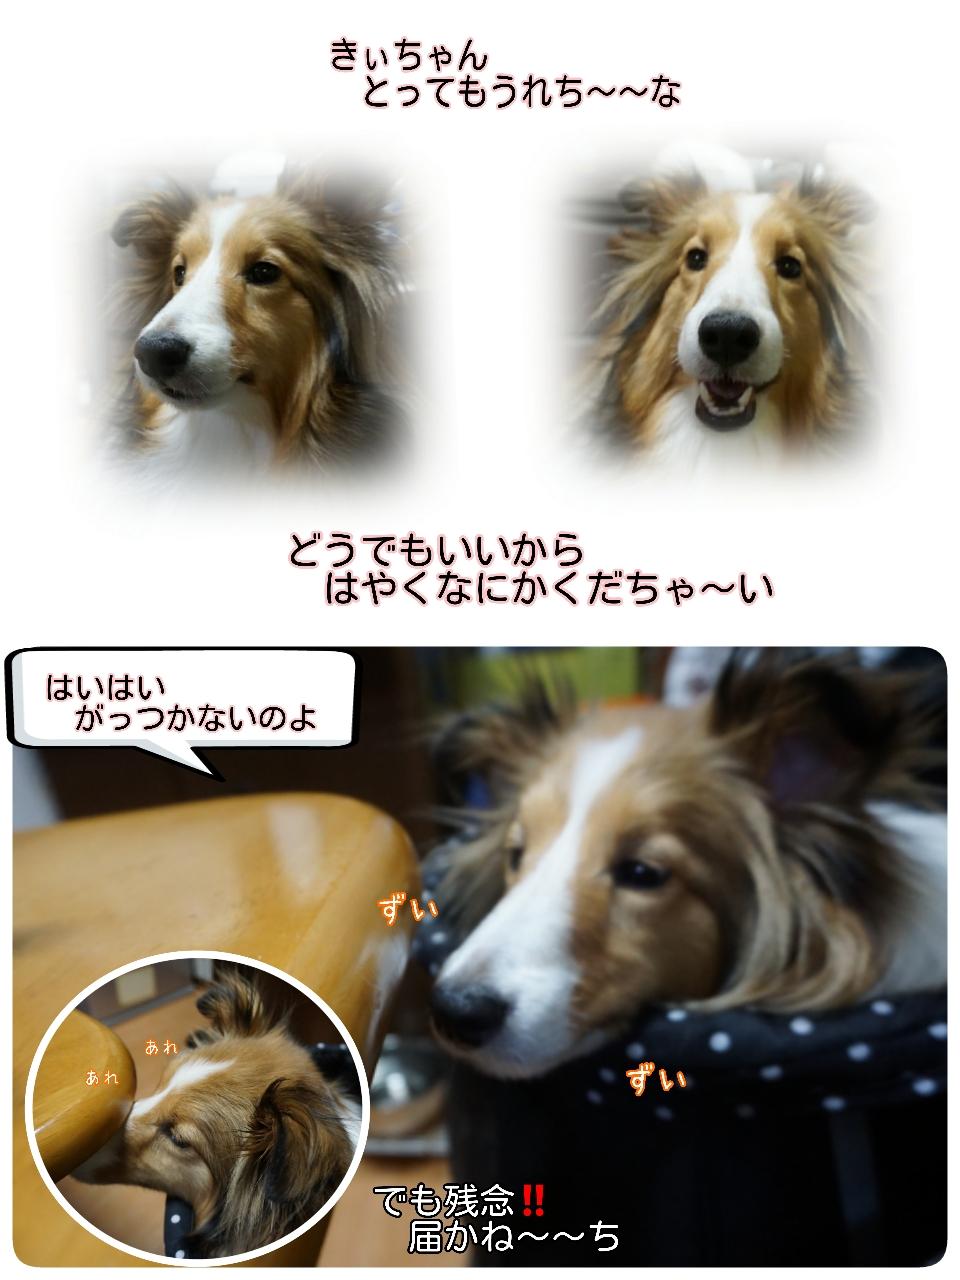 16-04-15-09-55-45-348_deco.jpg